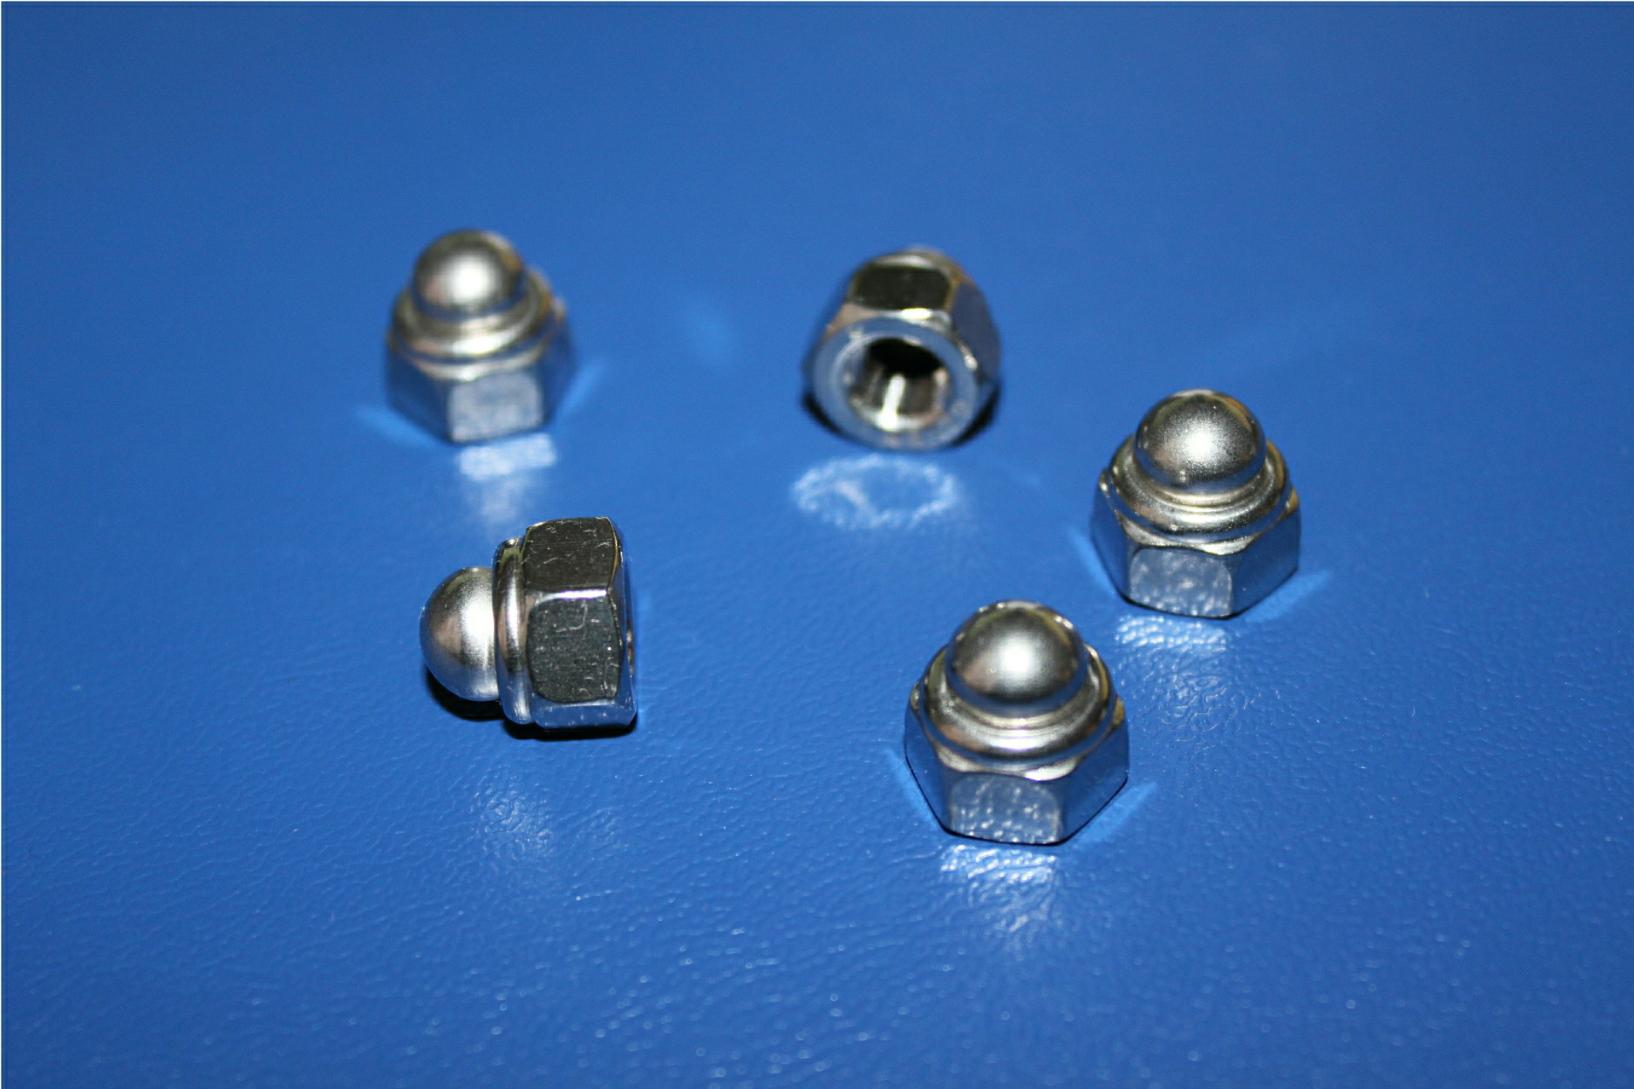 Hutmuttern M8 DIN 986 selbstsichernd 10 St/ück - Sechskant-Hutmuttern Stopmuttern Sicherungsmuttern Edelstahl A2